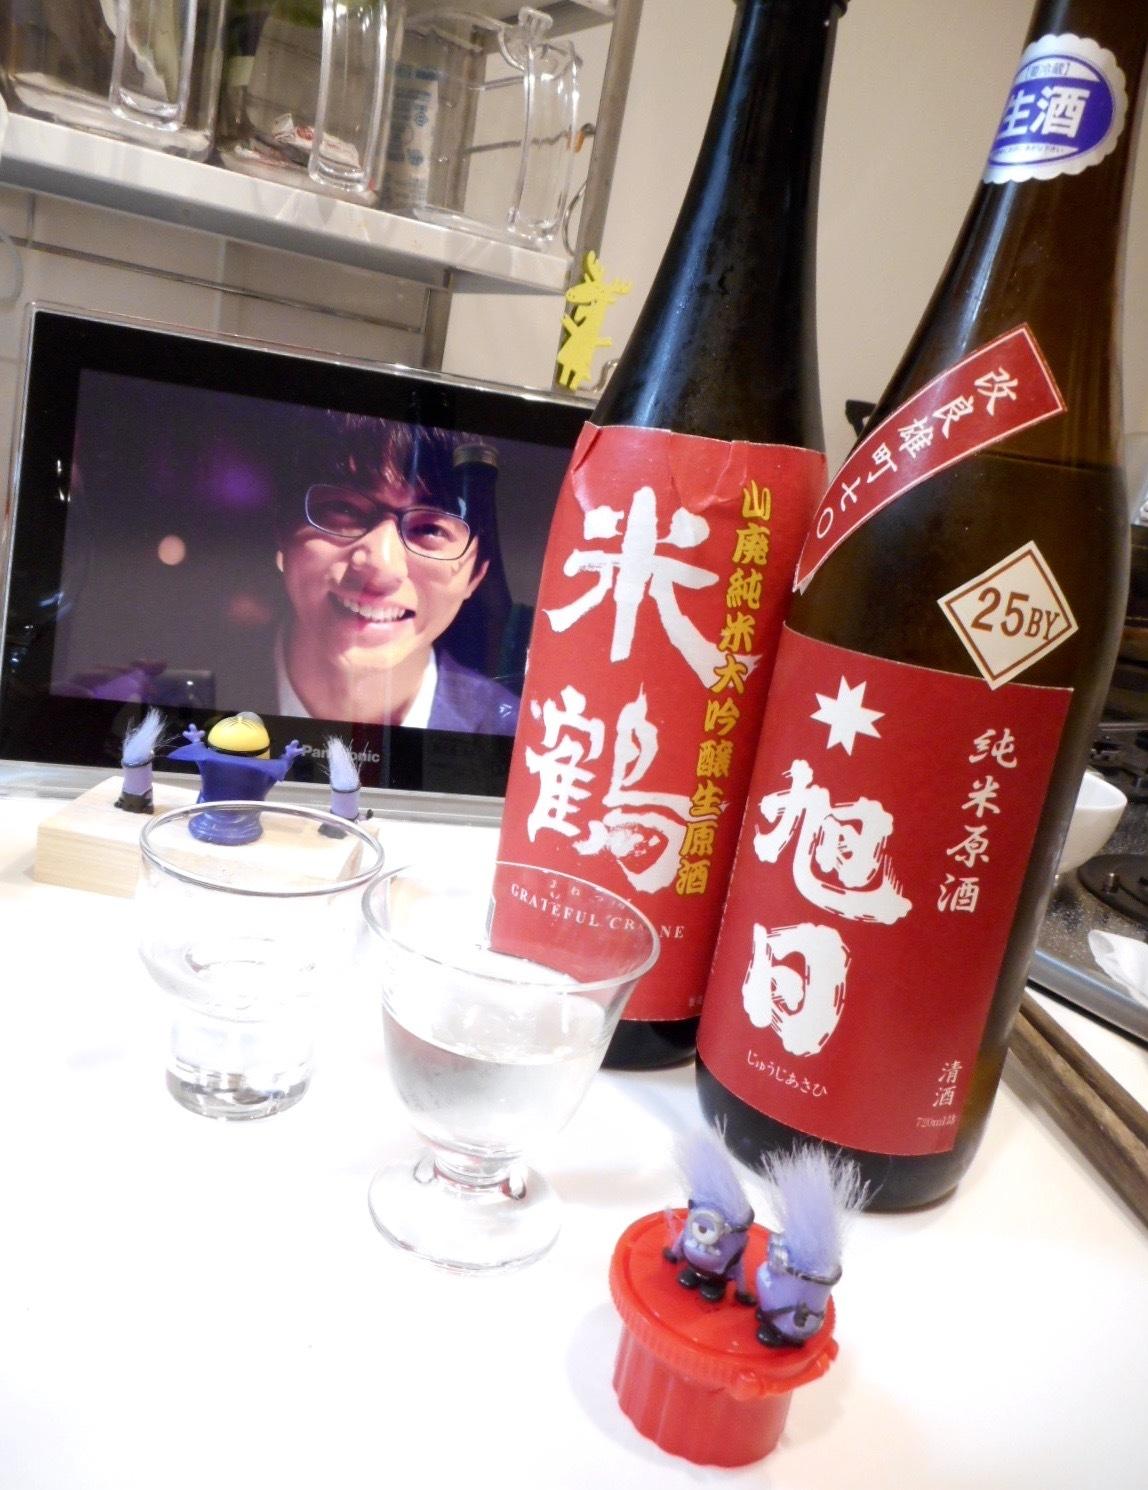 jujiasahi_omachi70_nama25by7.jpg